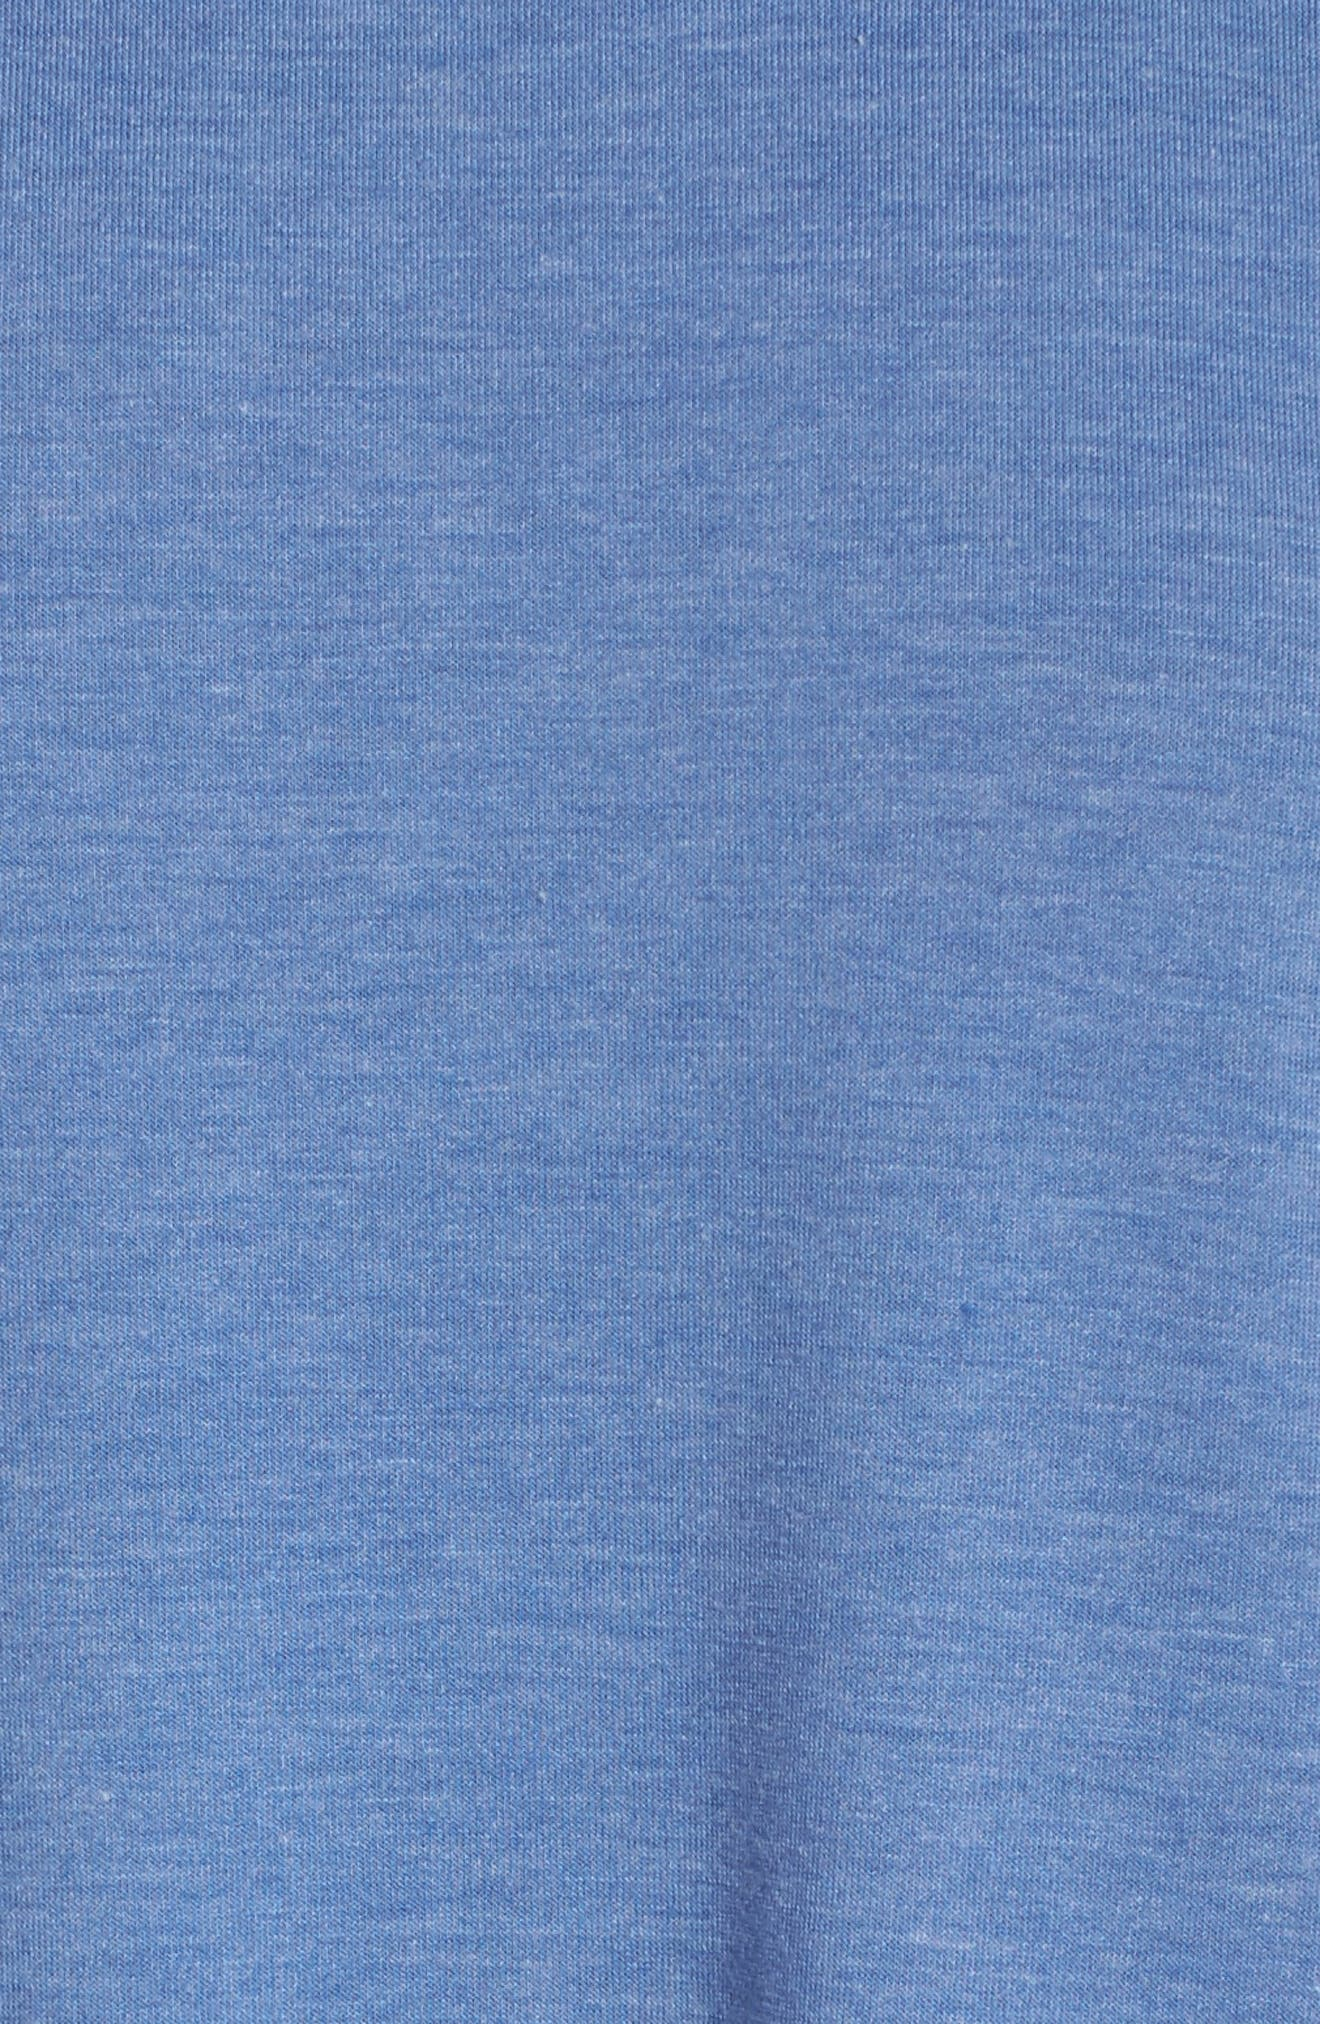 Honeydew All American Sleep Shirt,                             Alternate thumbnail 6, color,                             Sea Breezer